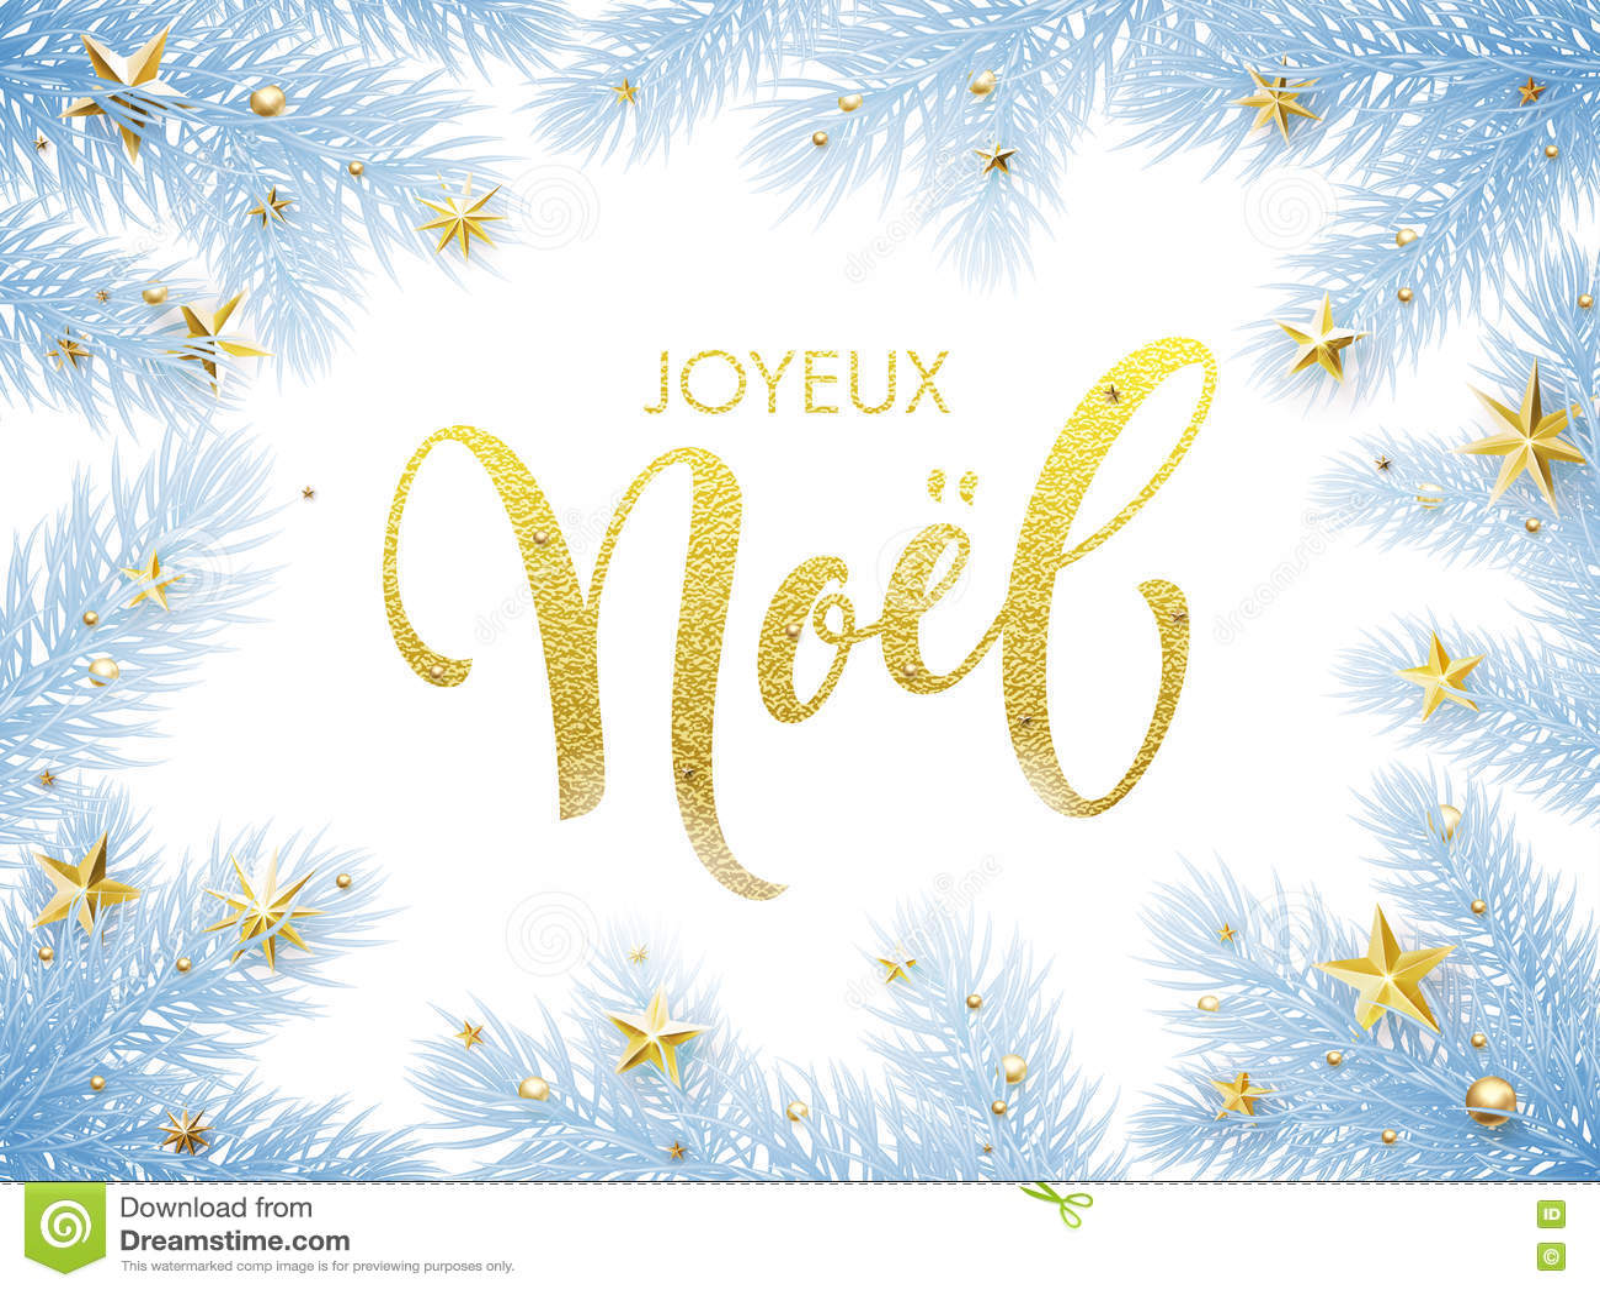 Auguri Di Buon Natale Francese.Buon Natale In Francese La Cartolina D Auguri Di Joyeux Noel